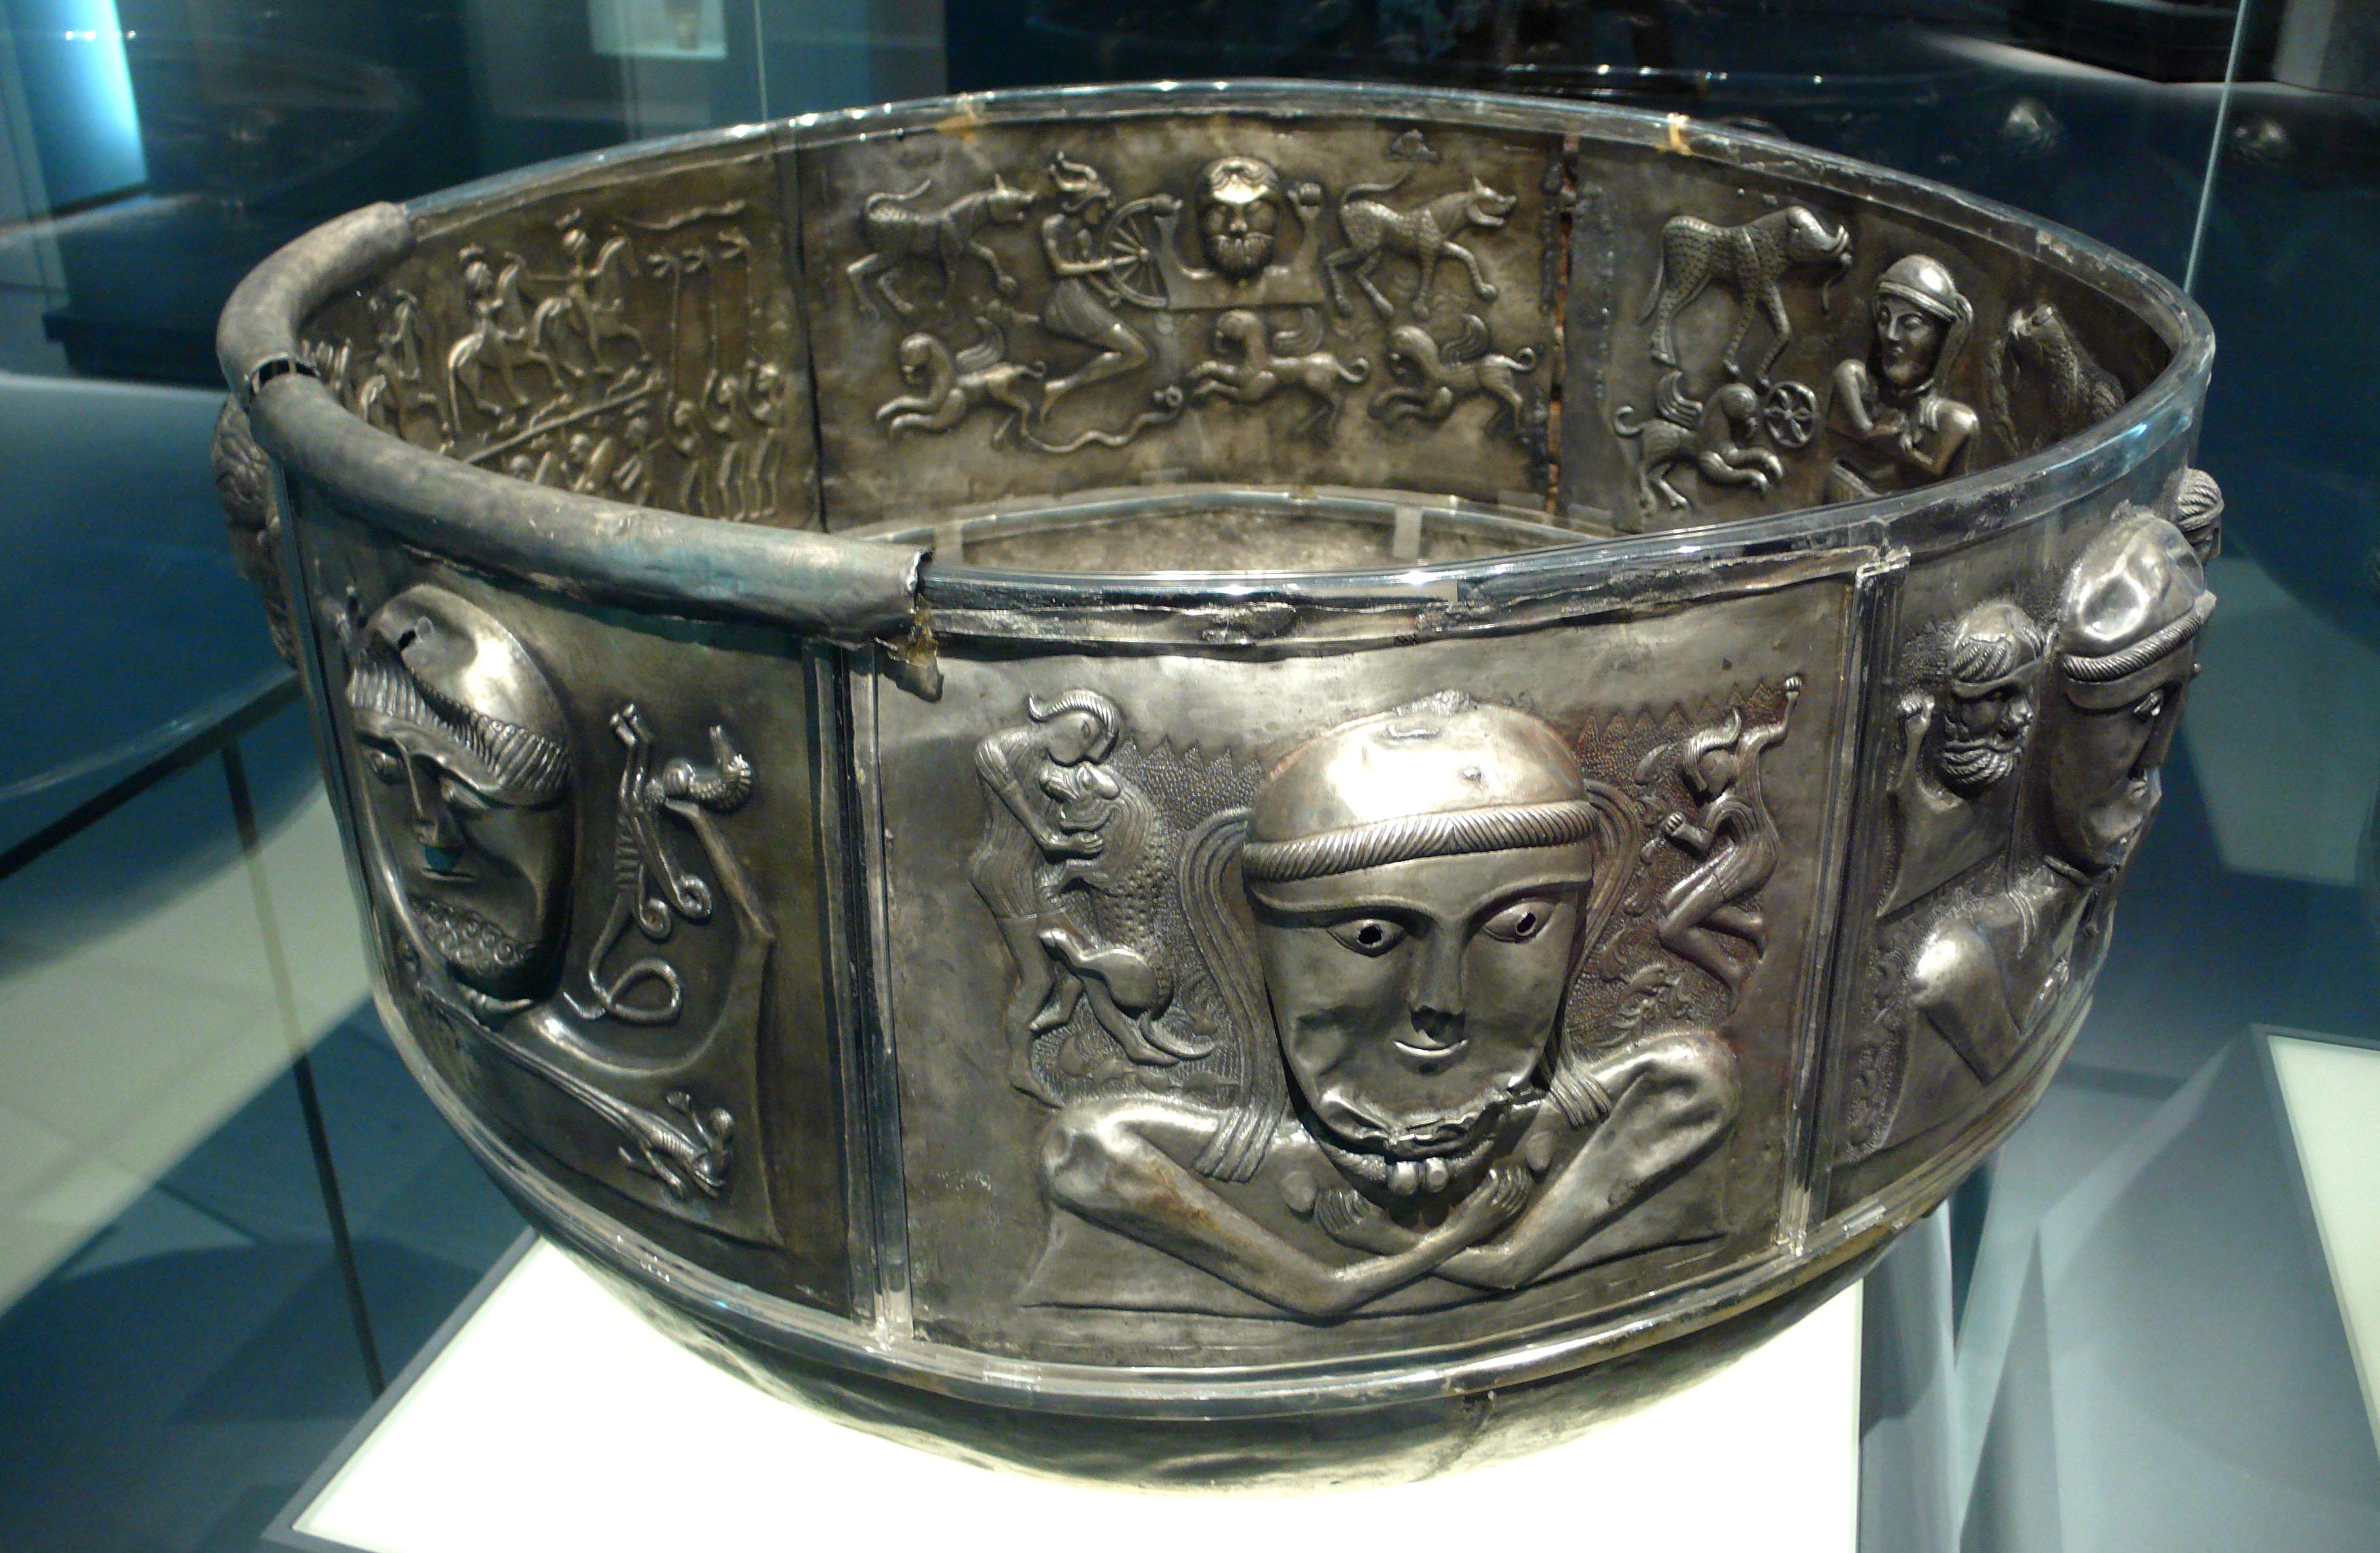 https://upload.wikimedia.org/wikipedia/commons/1/12/Silver_cauldron.jpg